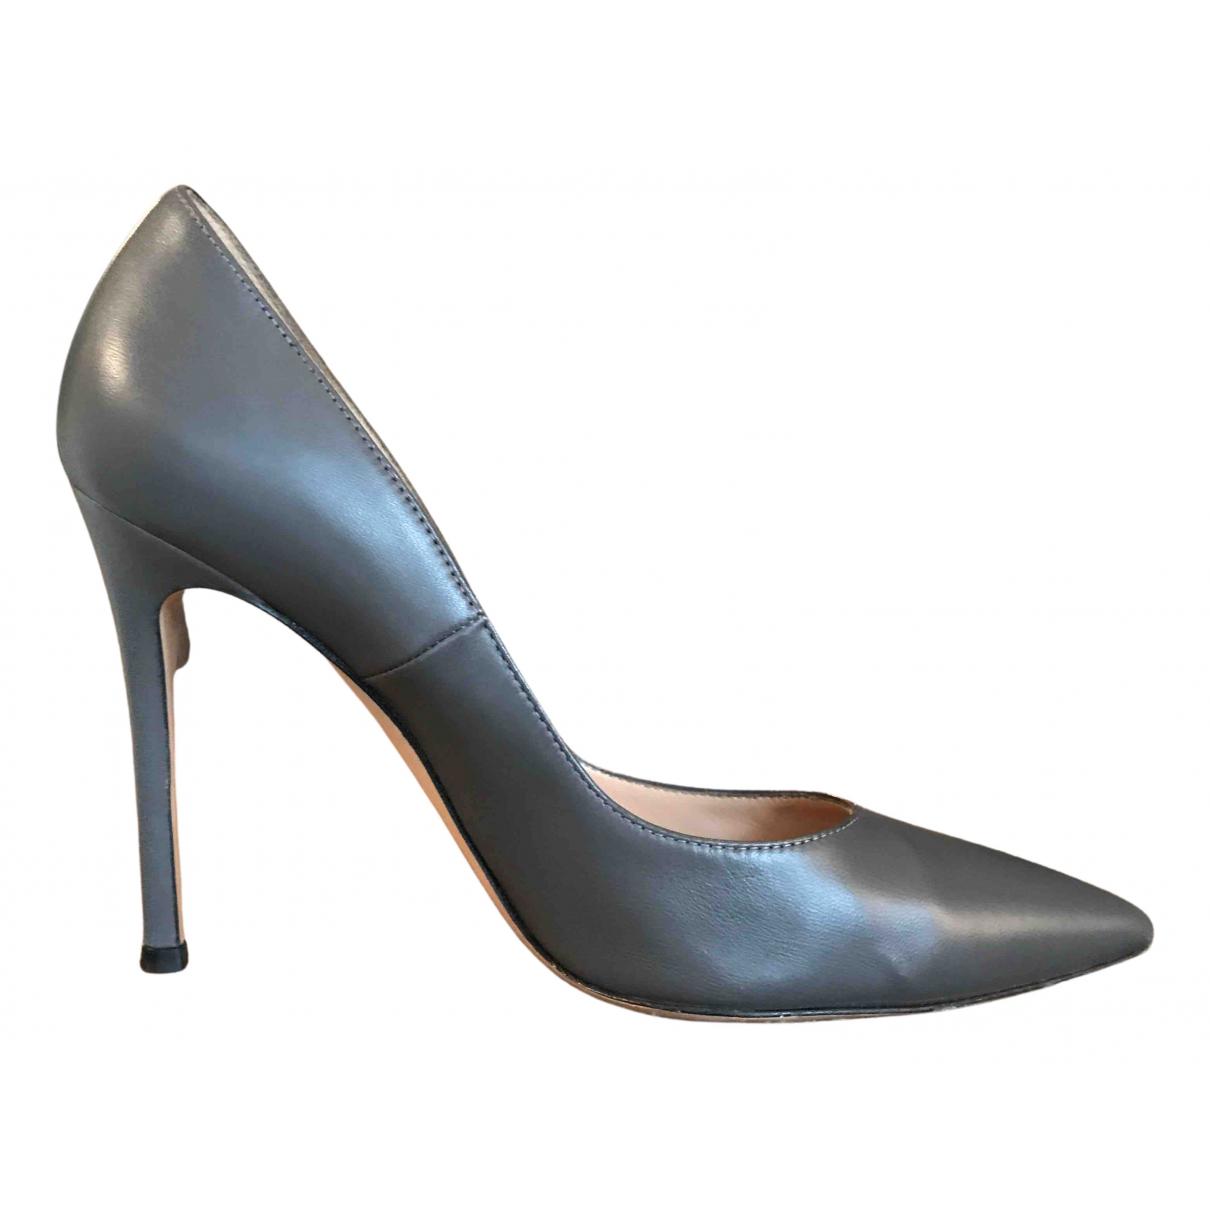 Gianvito Rossi - Escarpins   pour femme en cuir - gris